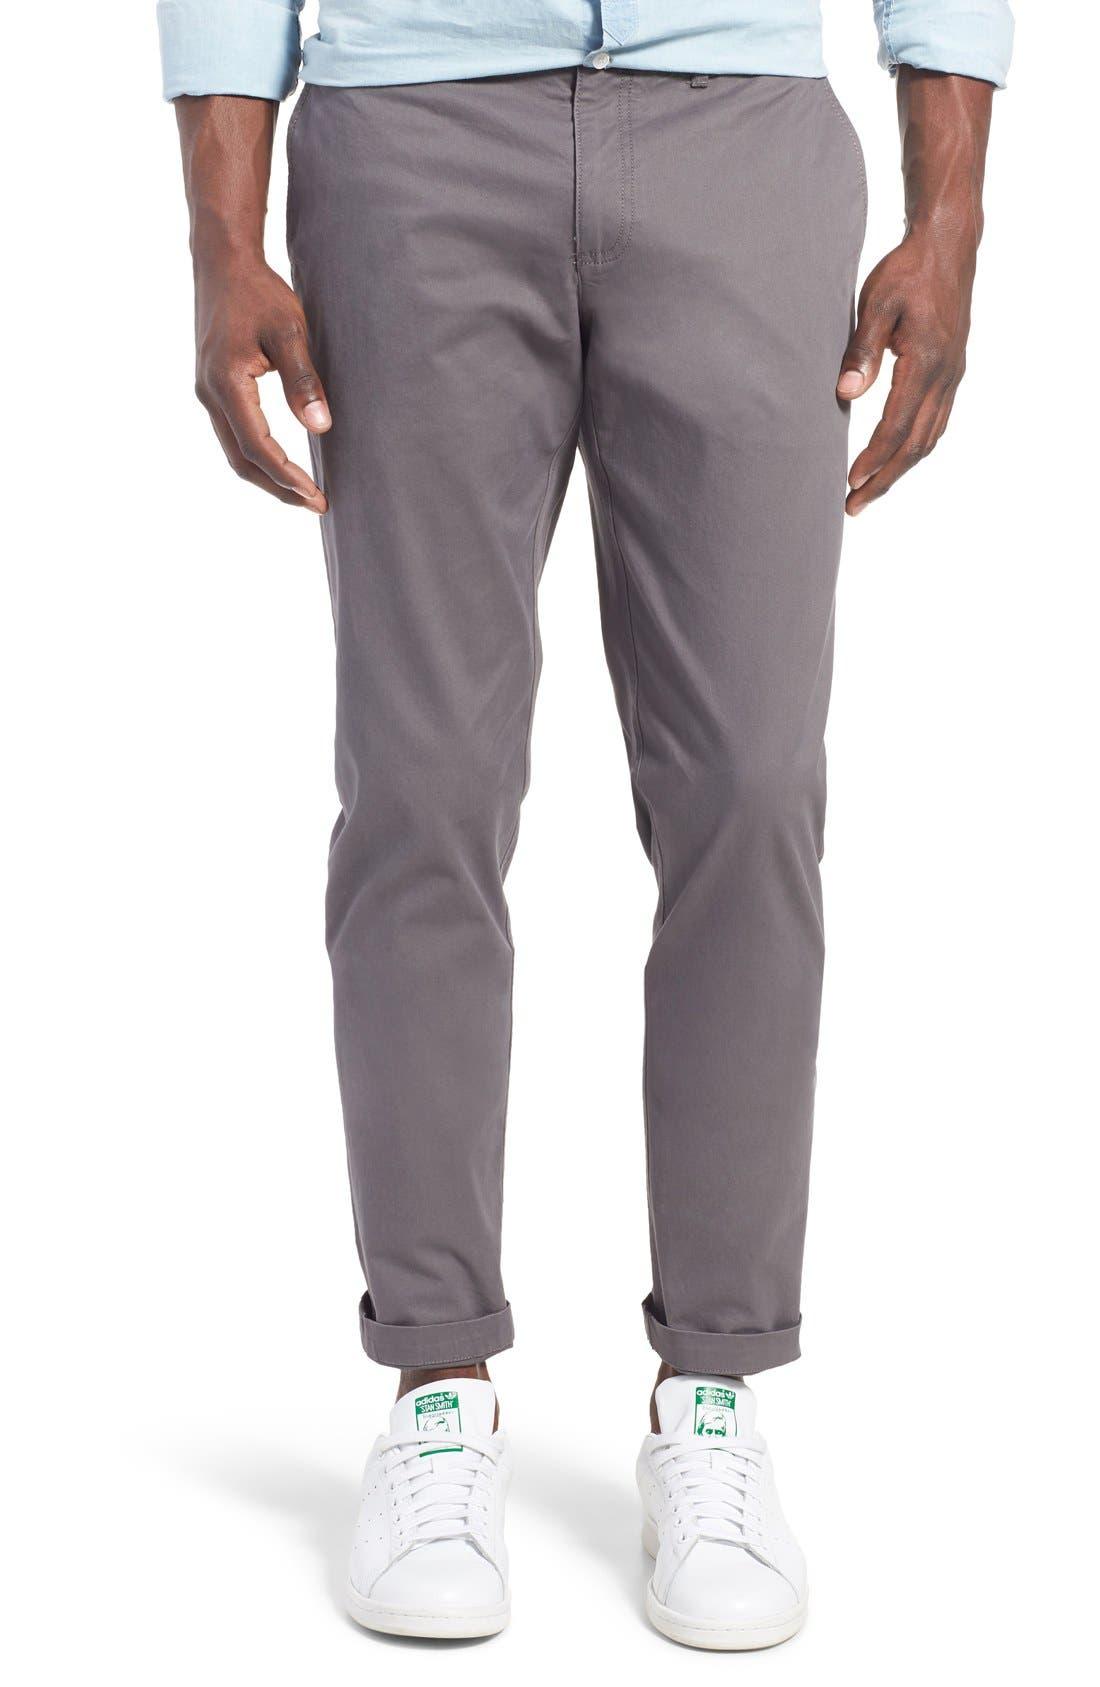 'P55' Slim Fit Stretch Cotton Chinos,                             Main thumbnail 1, color,                             CASTLEROCK